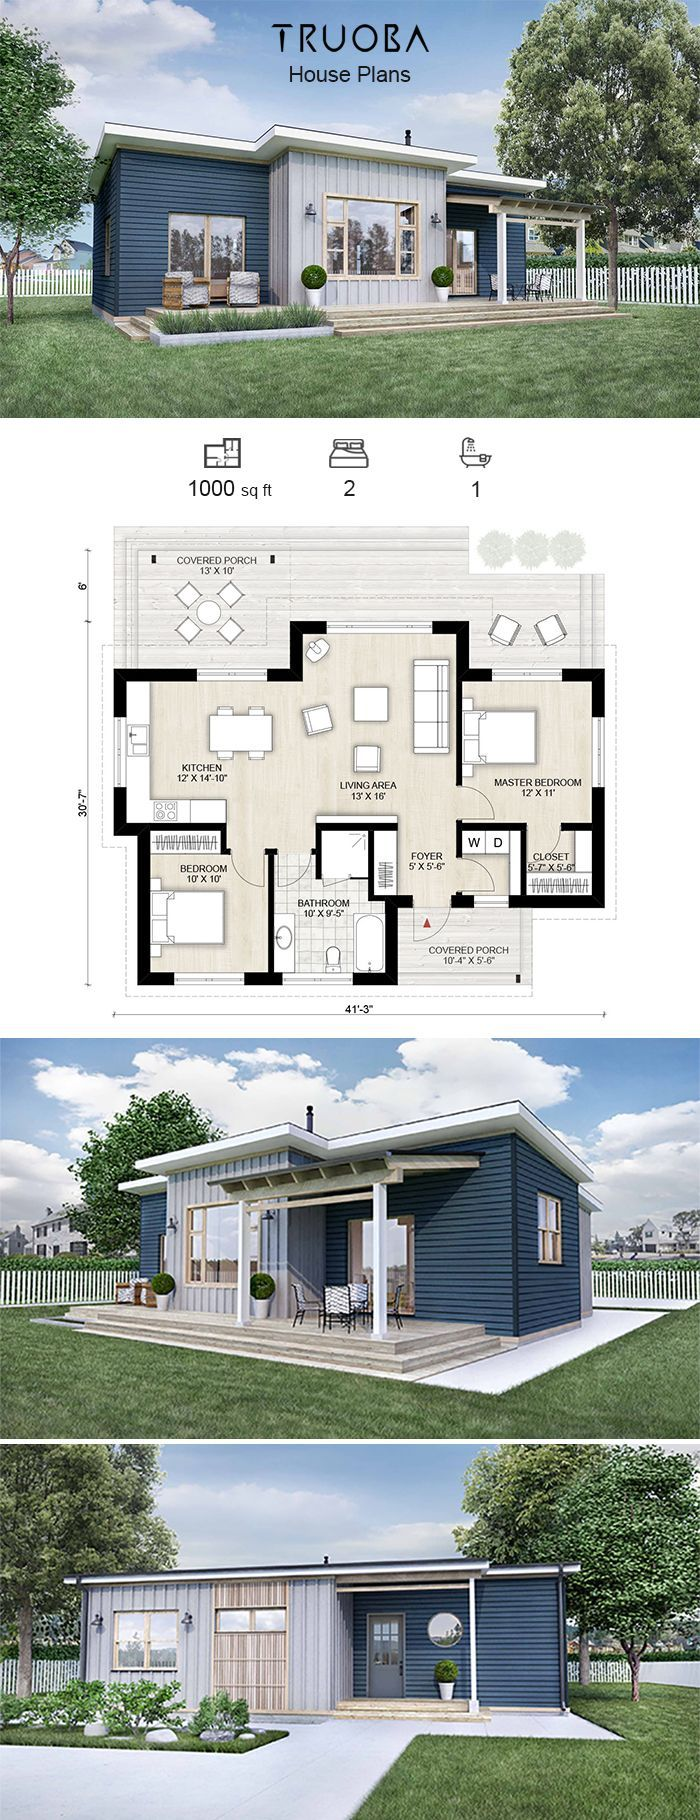 Truoba Mini 118 House Plan 1000 Sq Ft 2 Bedrooms 1 Bathrooms 2bedroomtinyhomes Sims House Plans House Layouts Tiny House Plans